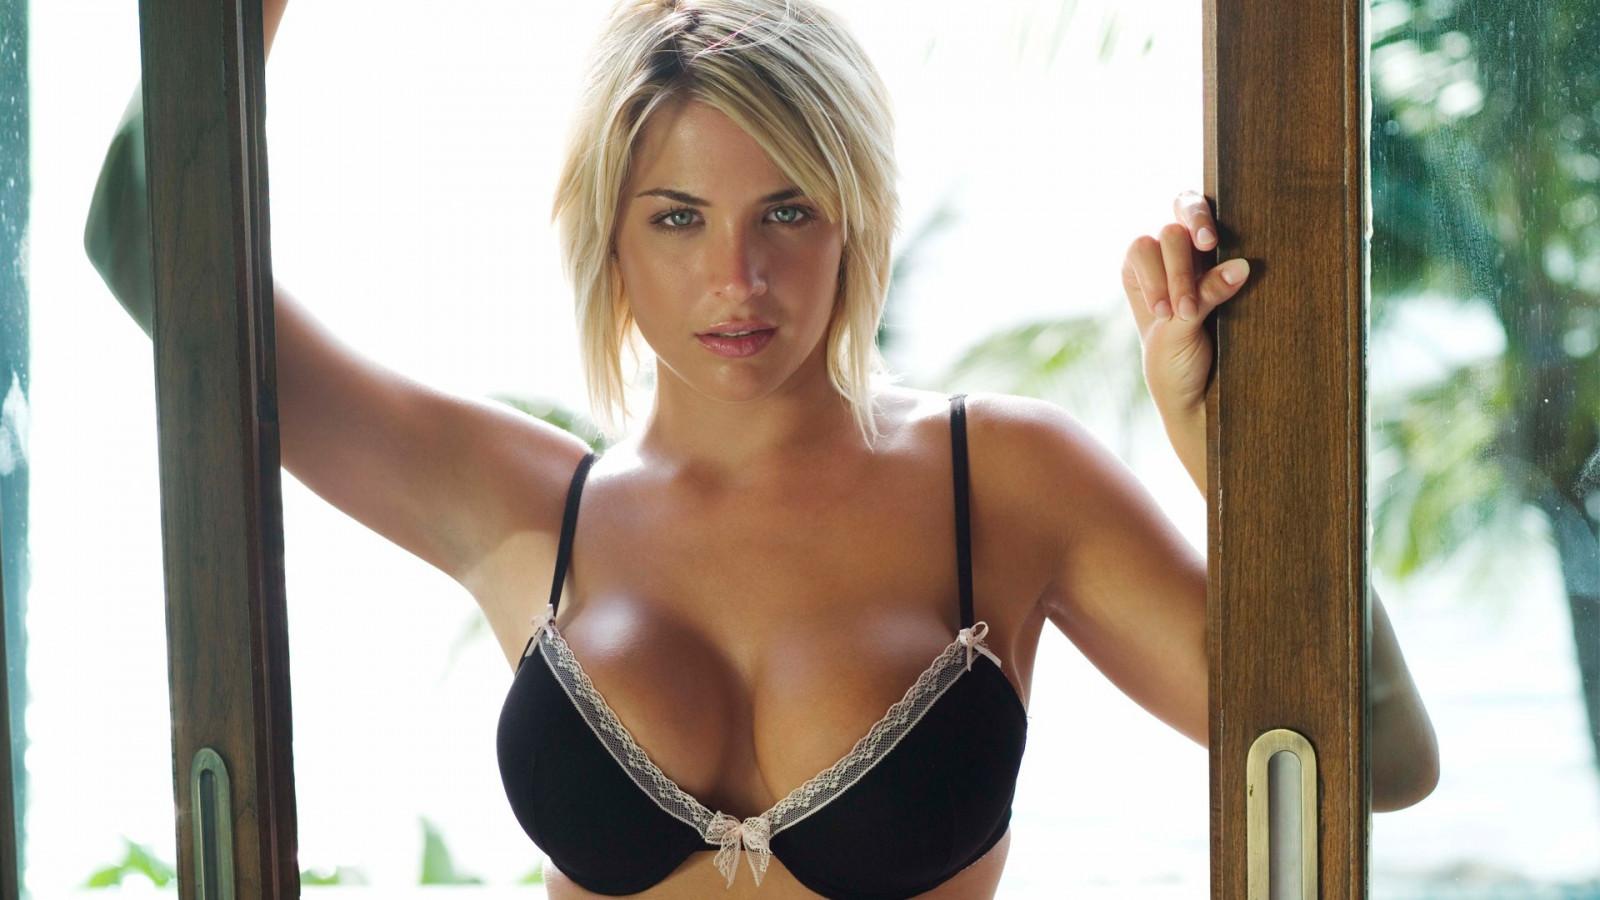 Jemma palmer sex tape, mature latina pussy pics